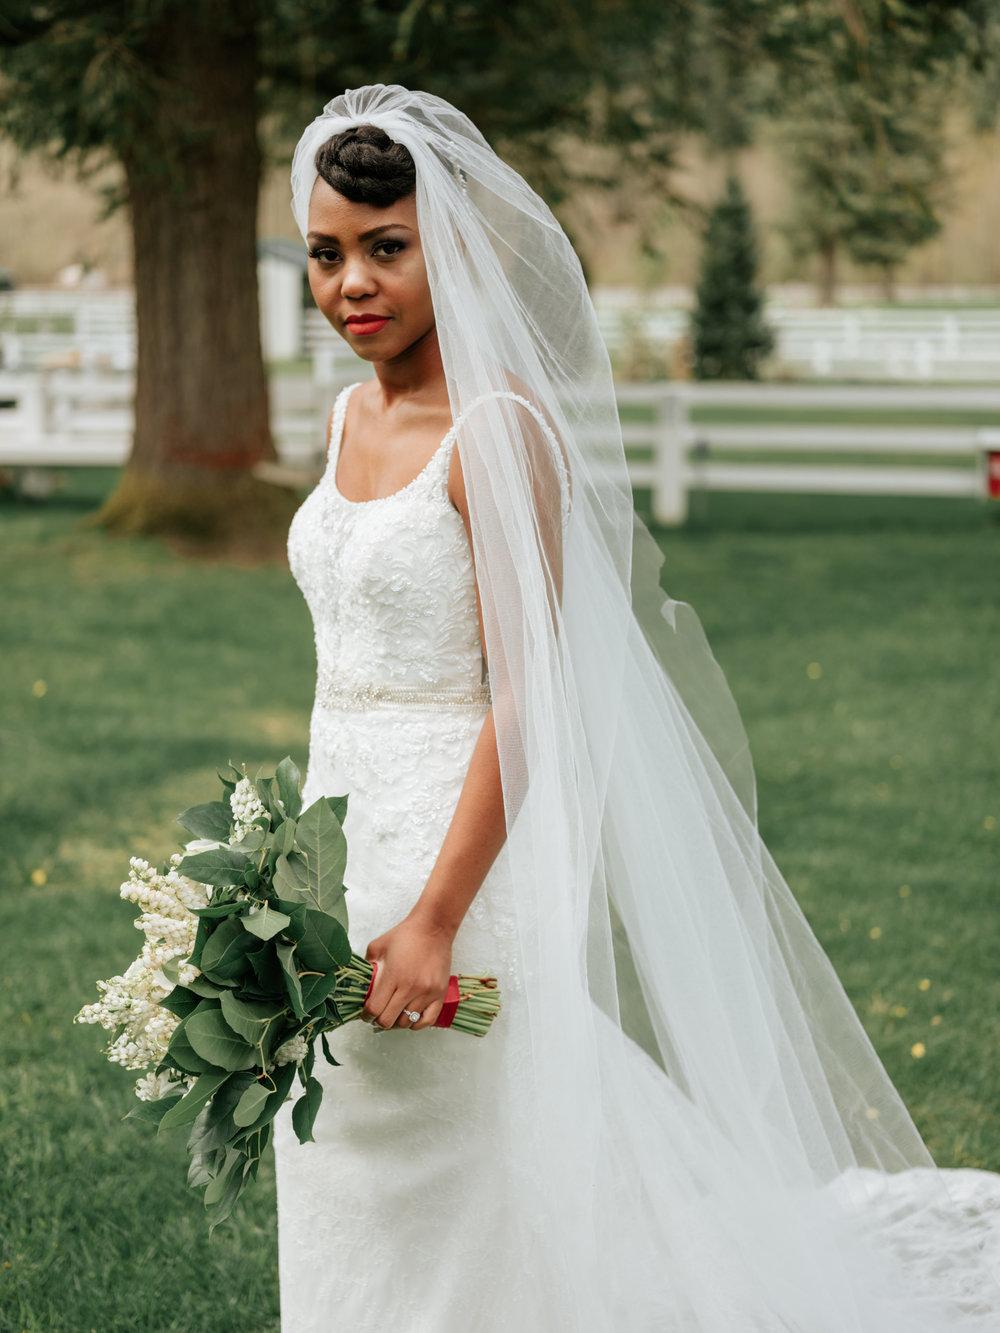 Stolen Glimpses Seattle Wedding Photographer at Rein Fire Ranch 8.jpg